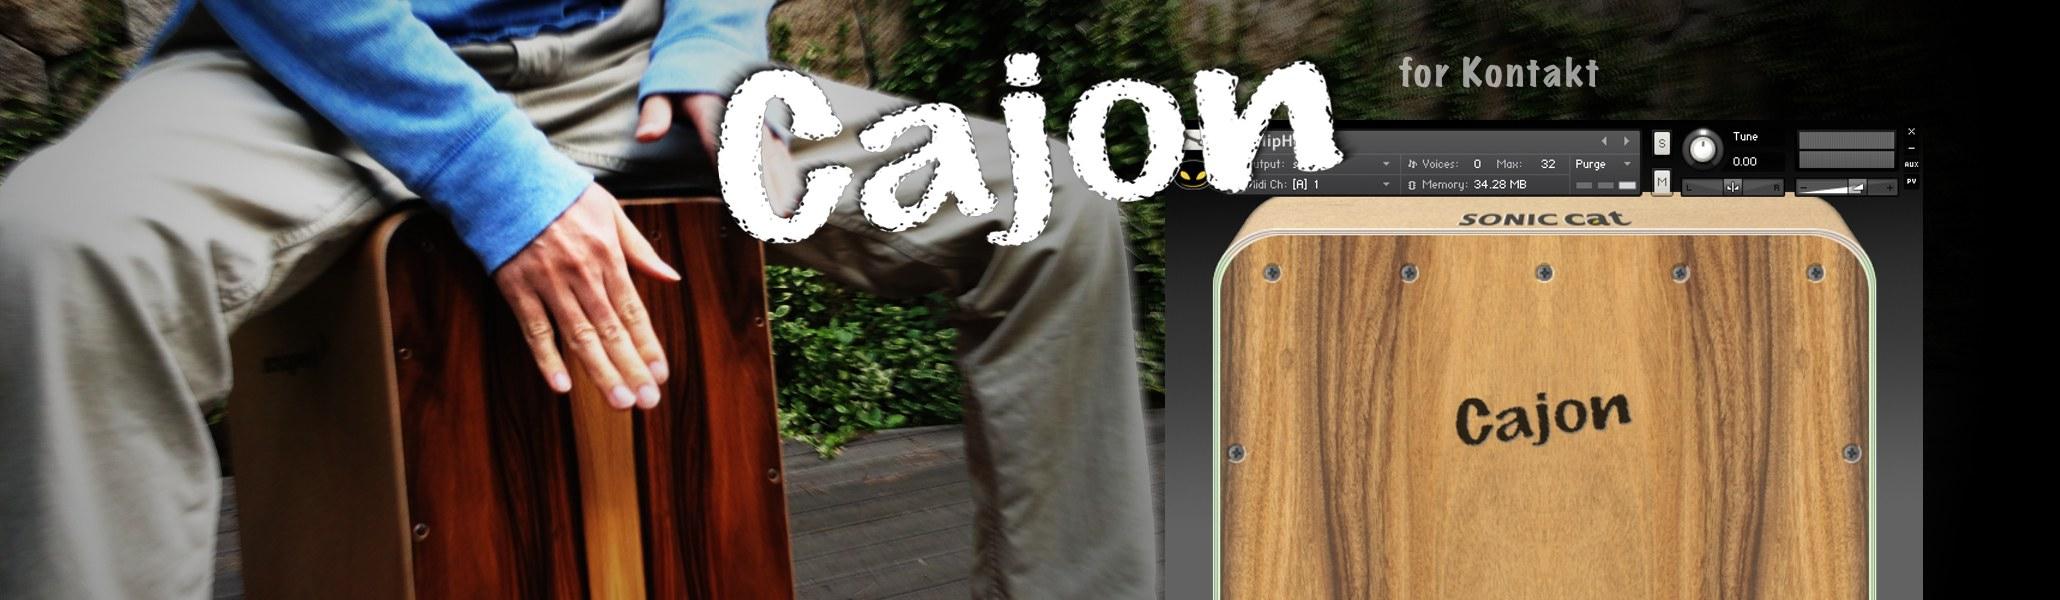 Cajon Title Image